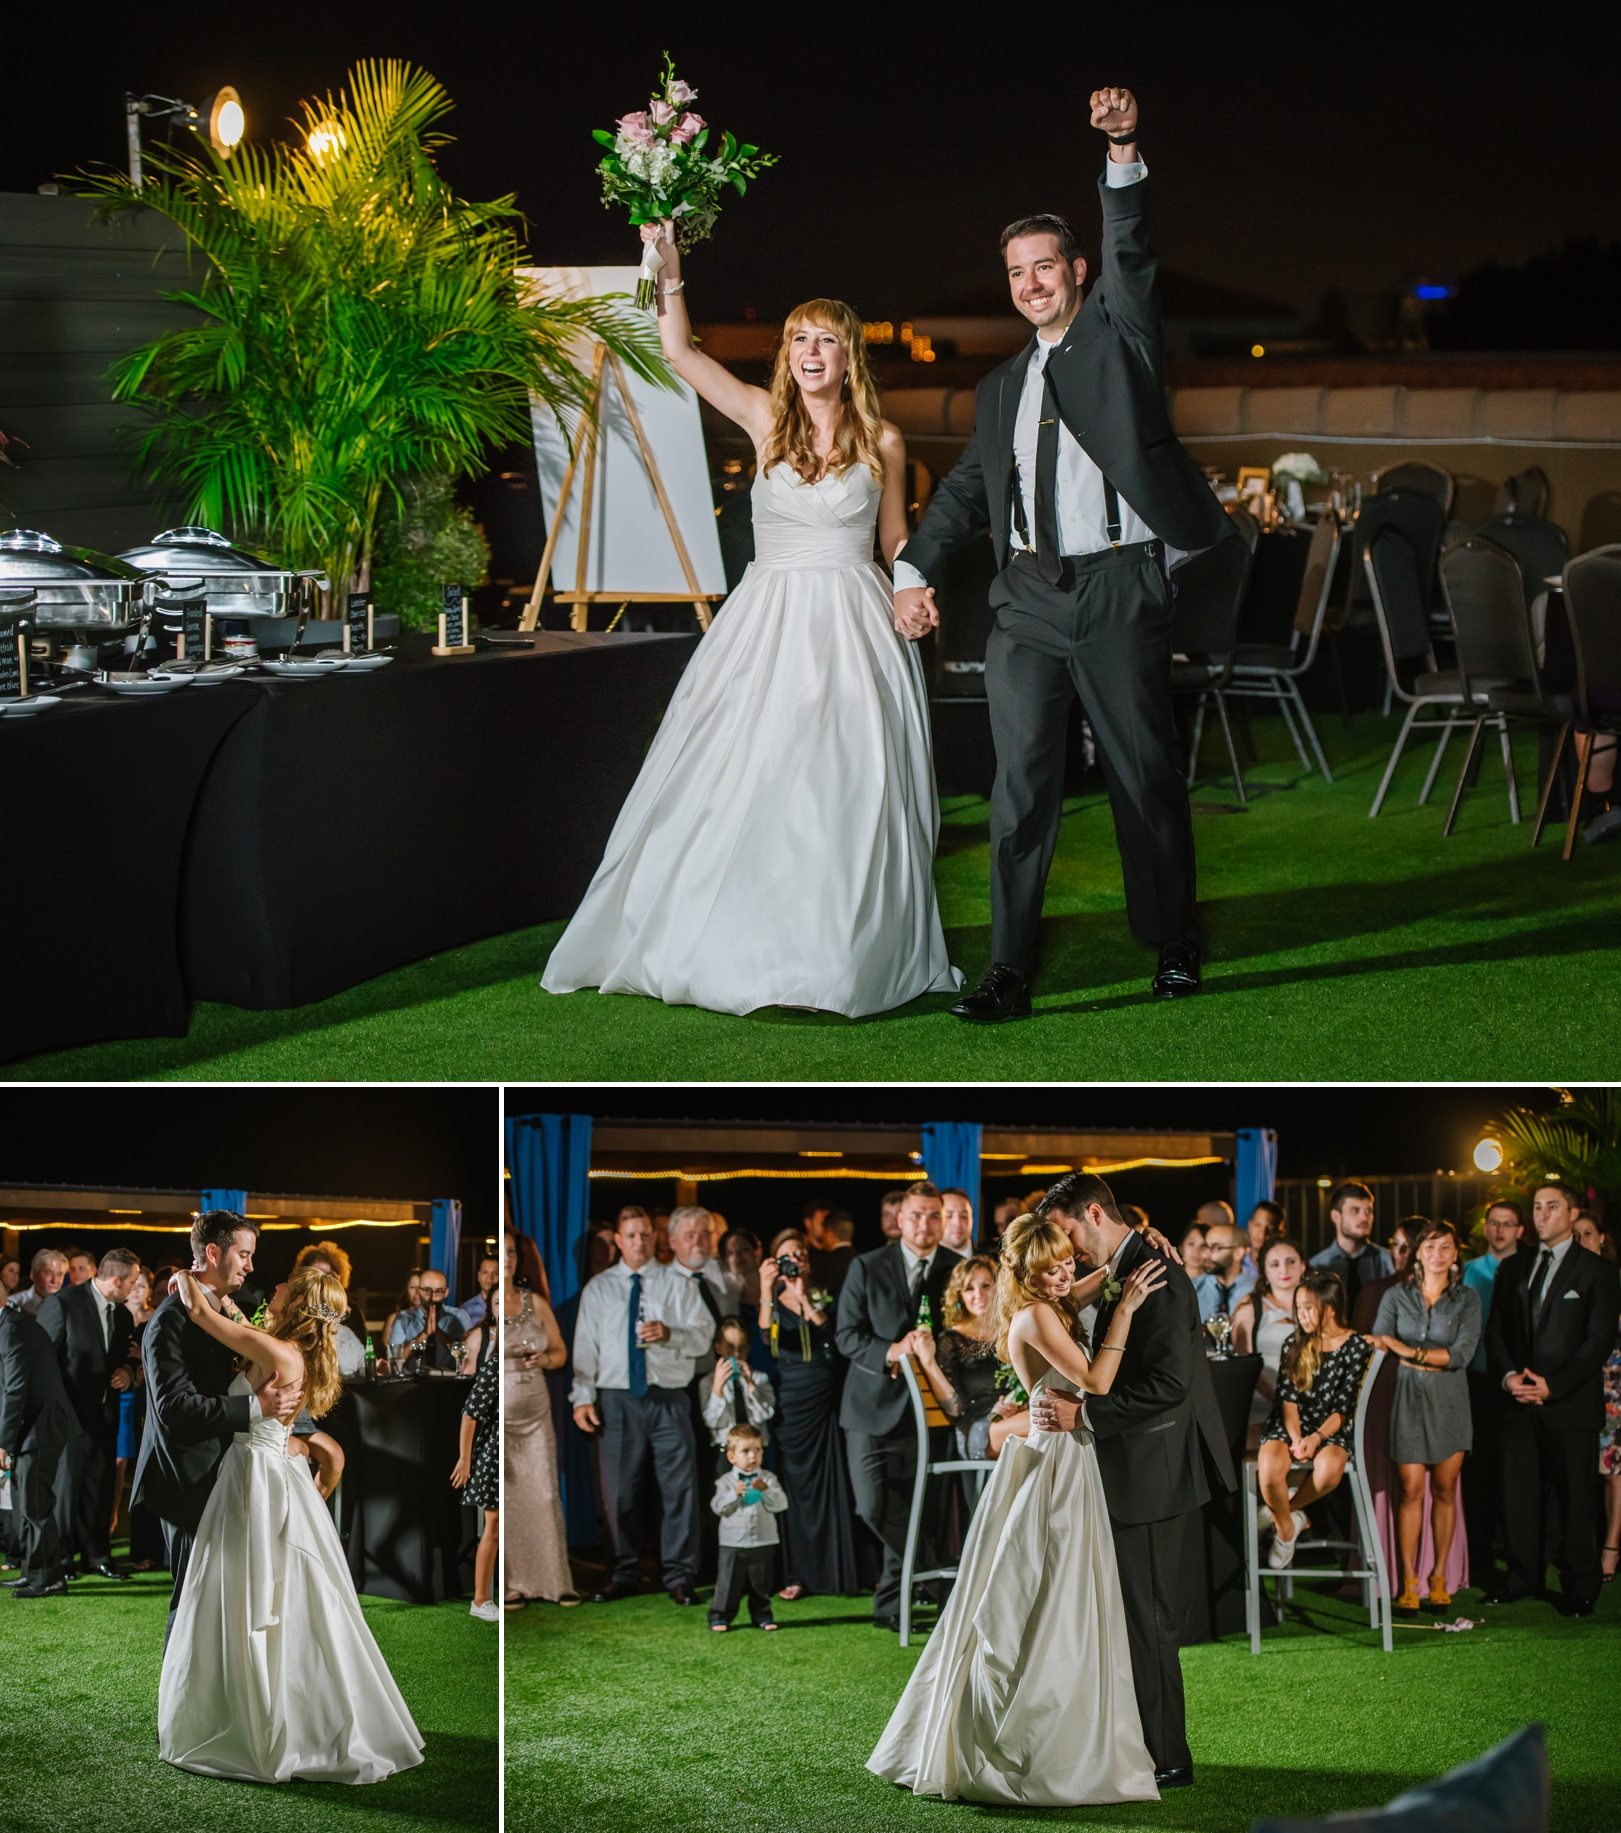 st-pete-hotel-zamora-sunken-gardens-rooftop-wedding-photography_0015.jpg